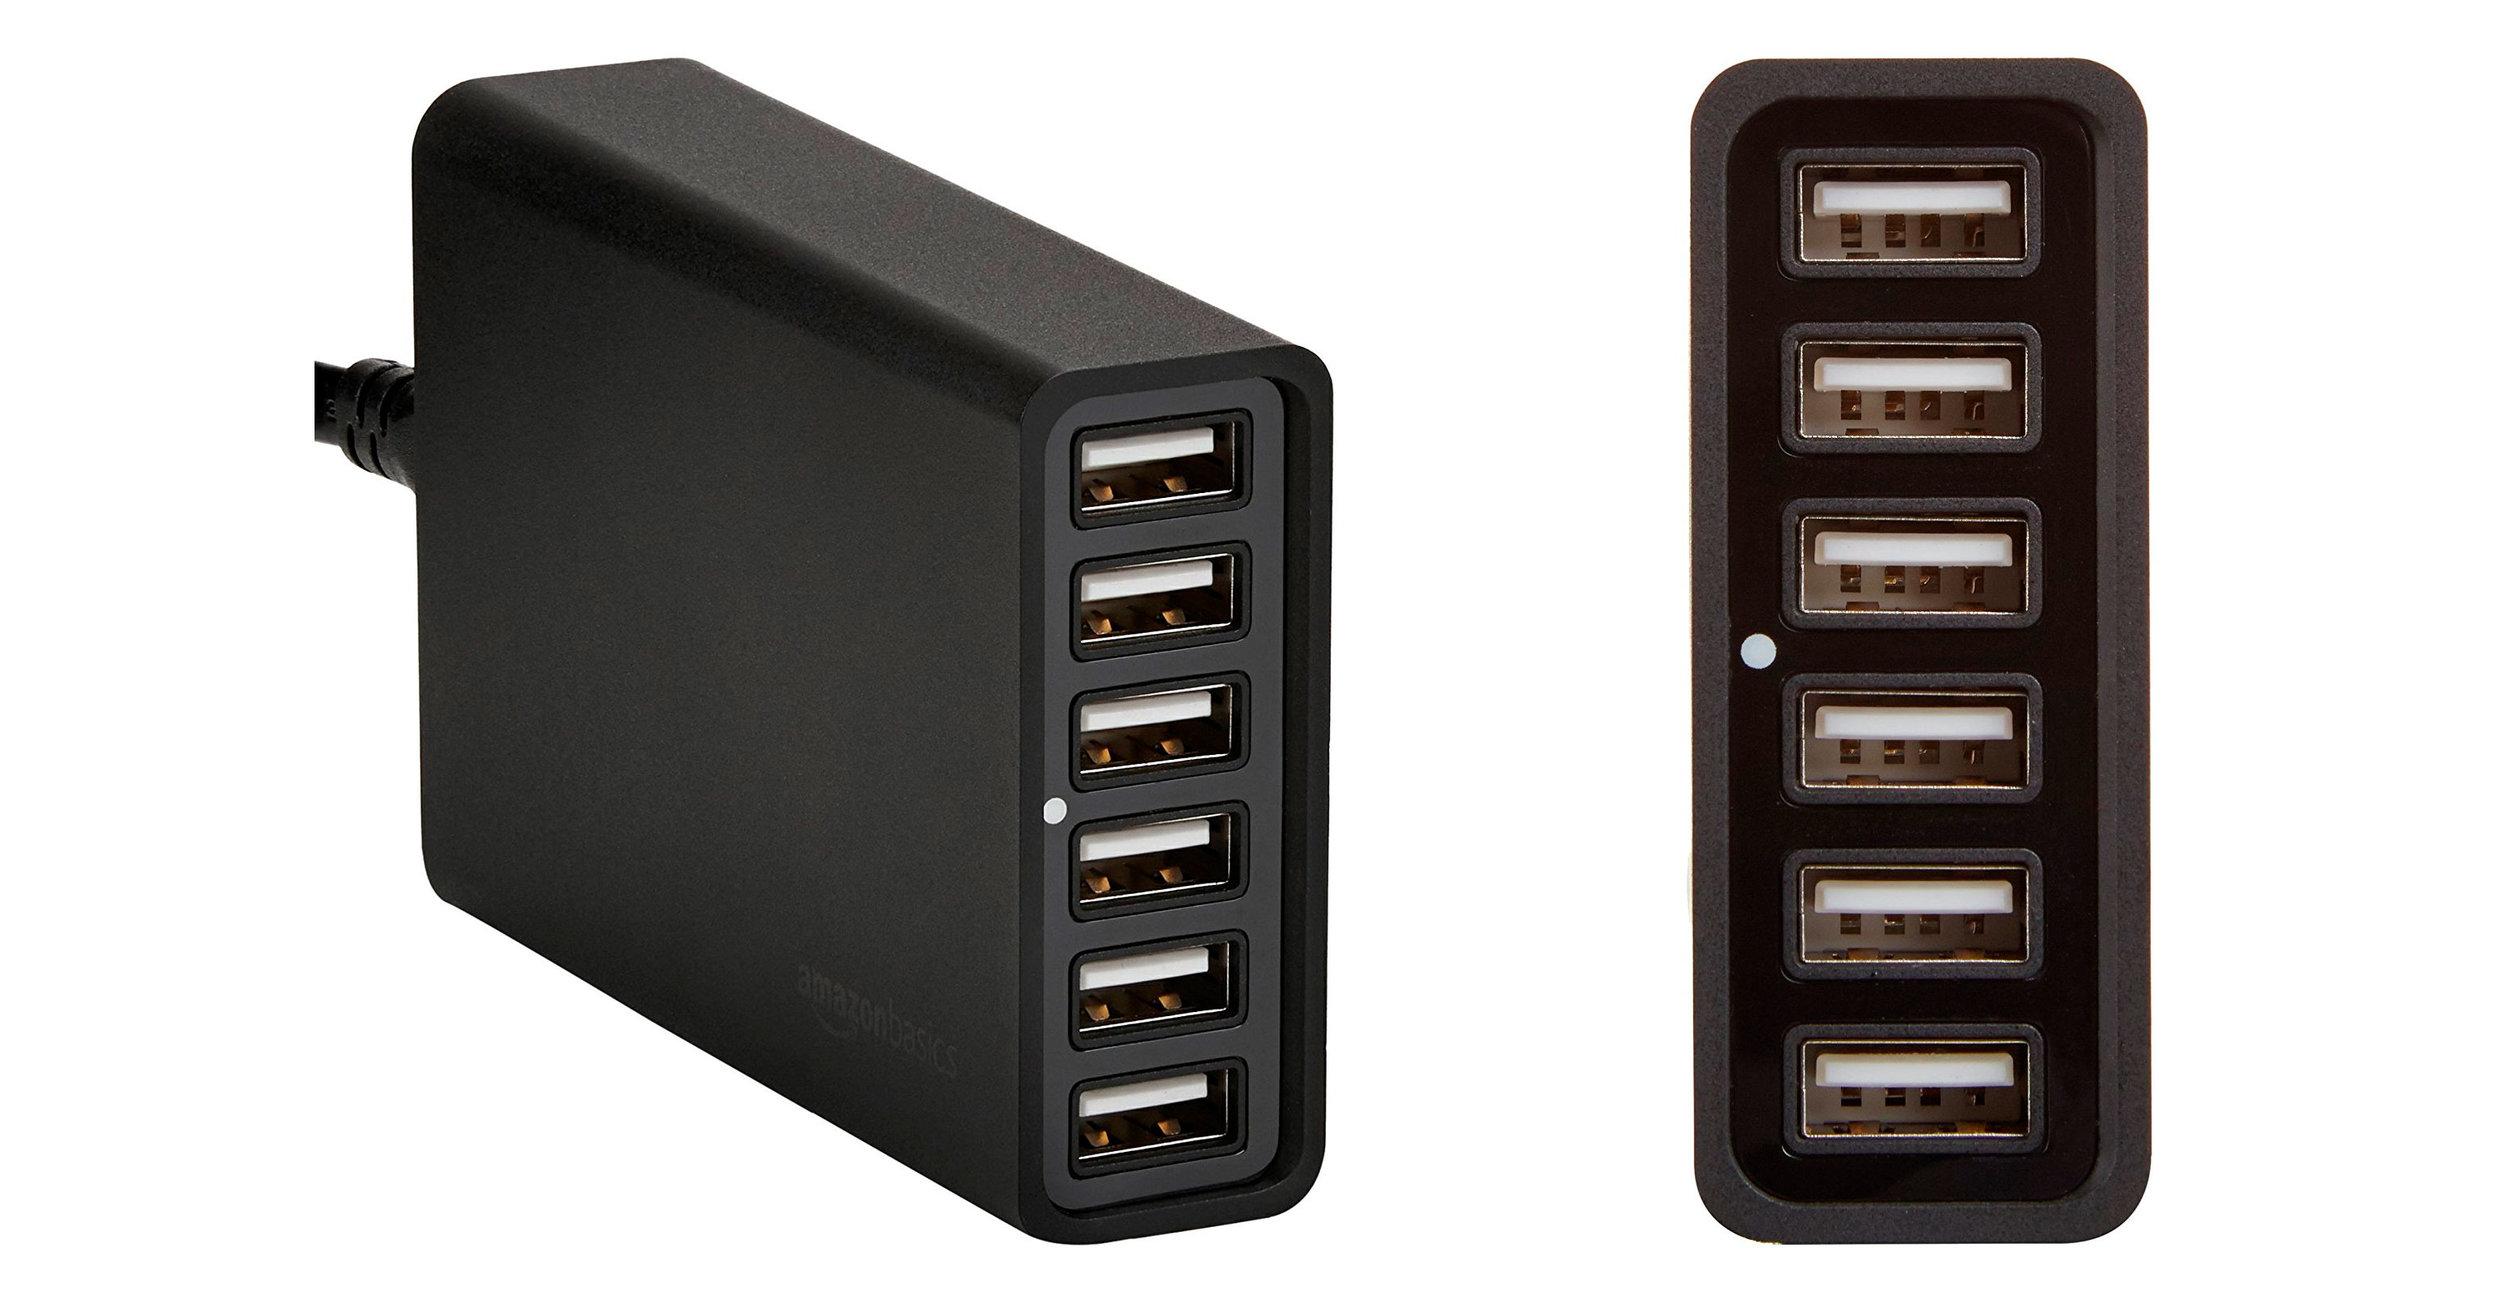 60W 6-port USB charger - Amazon Basics